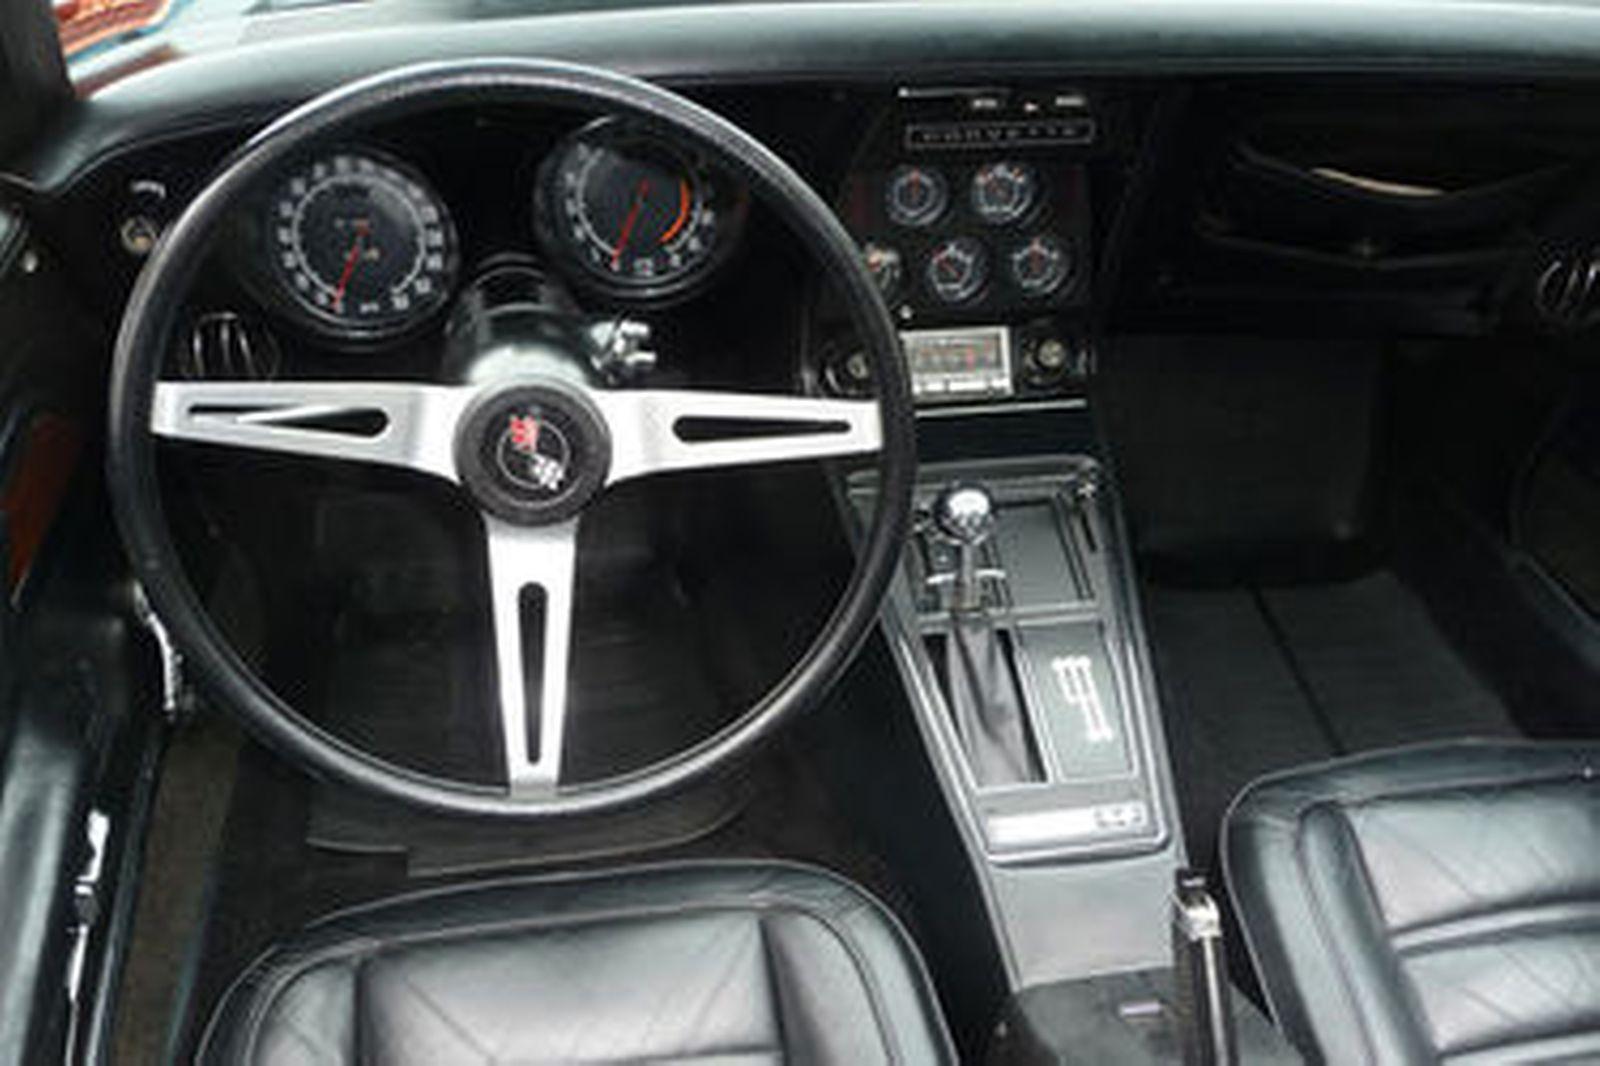 Chevrolet Corvette 'Targa' Coupe (LHD)